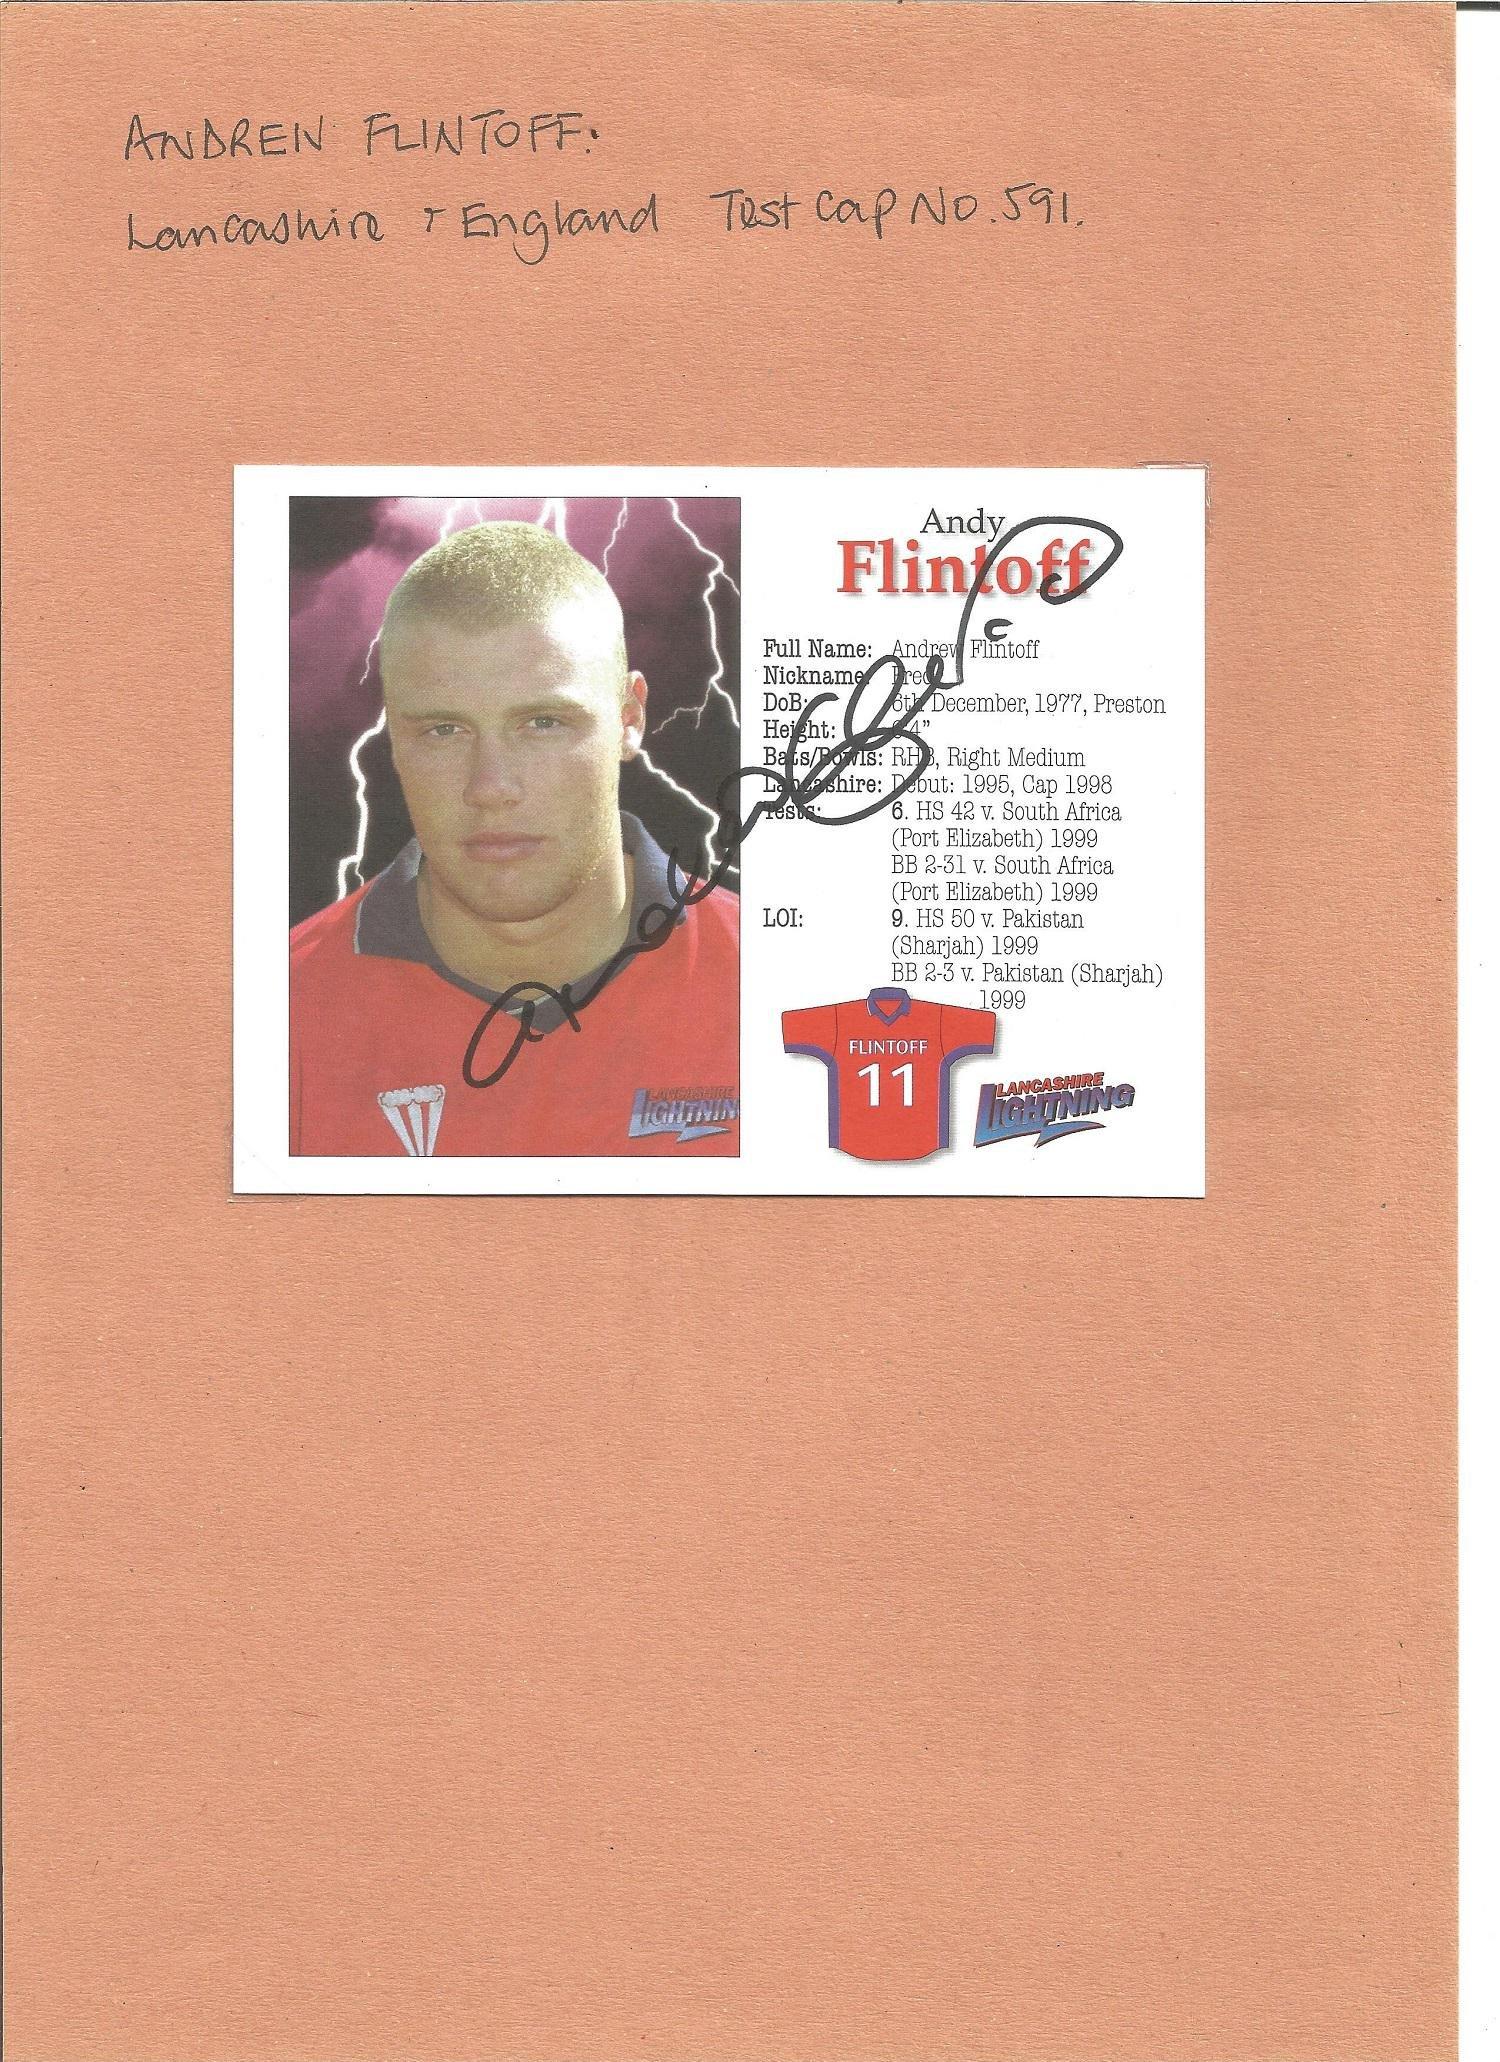 Andrew Flintoff signed 6x4 colour postcard. Good